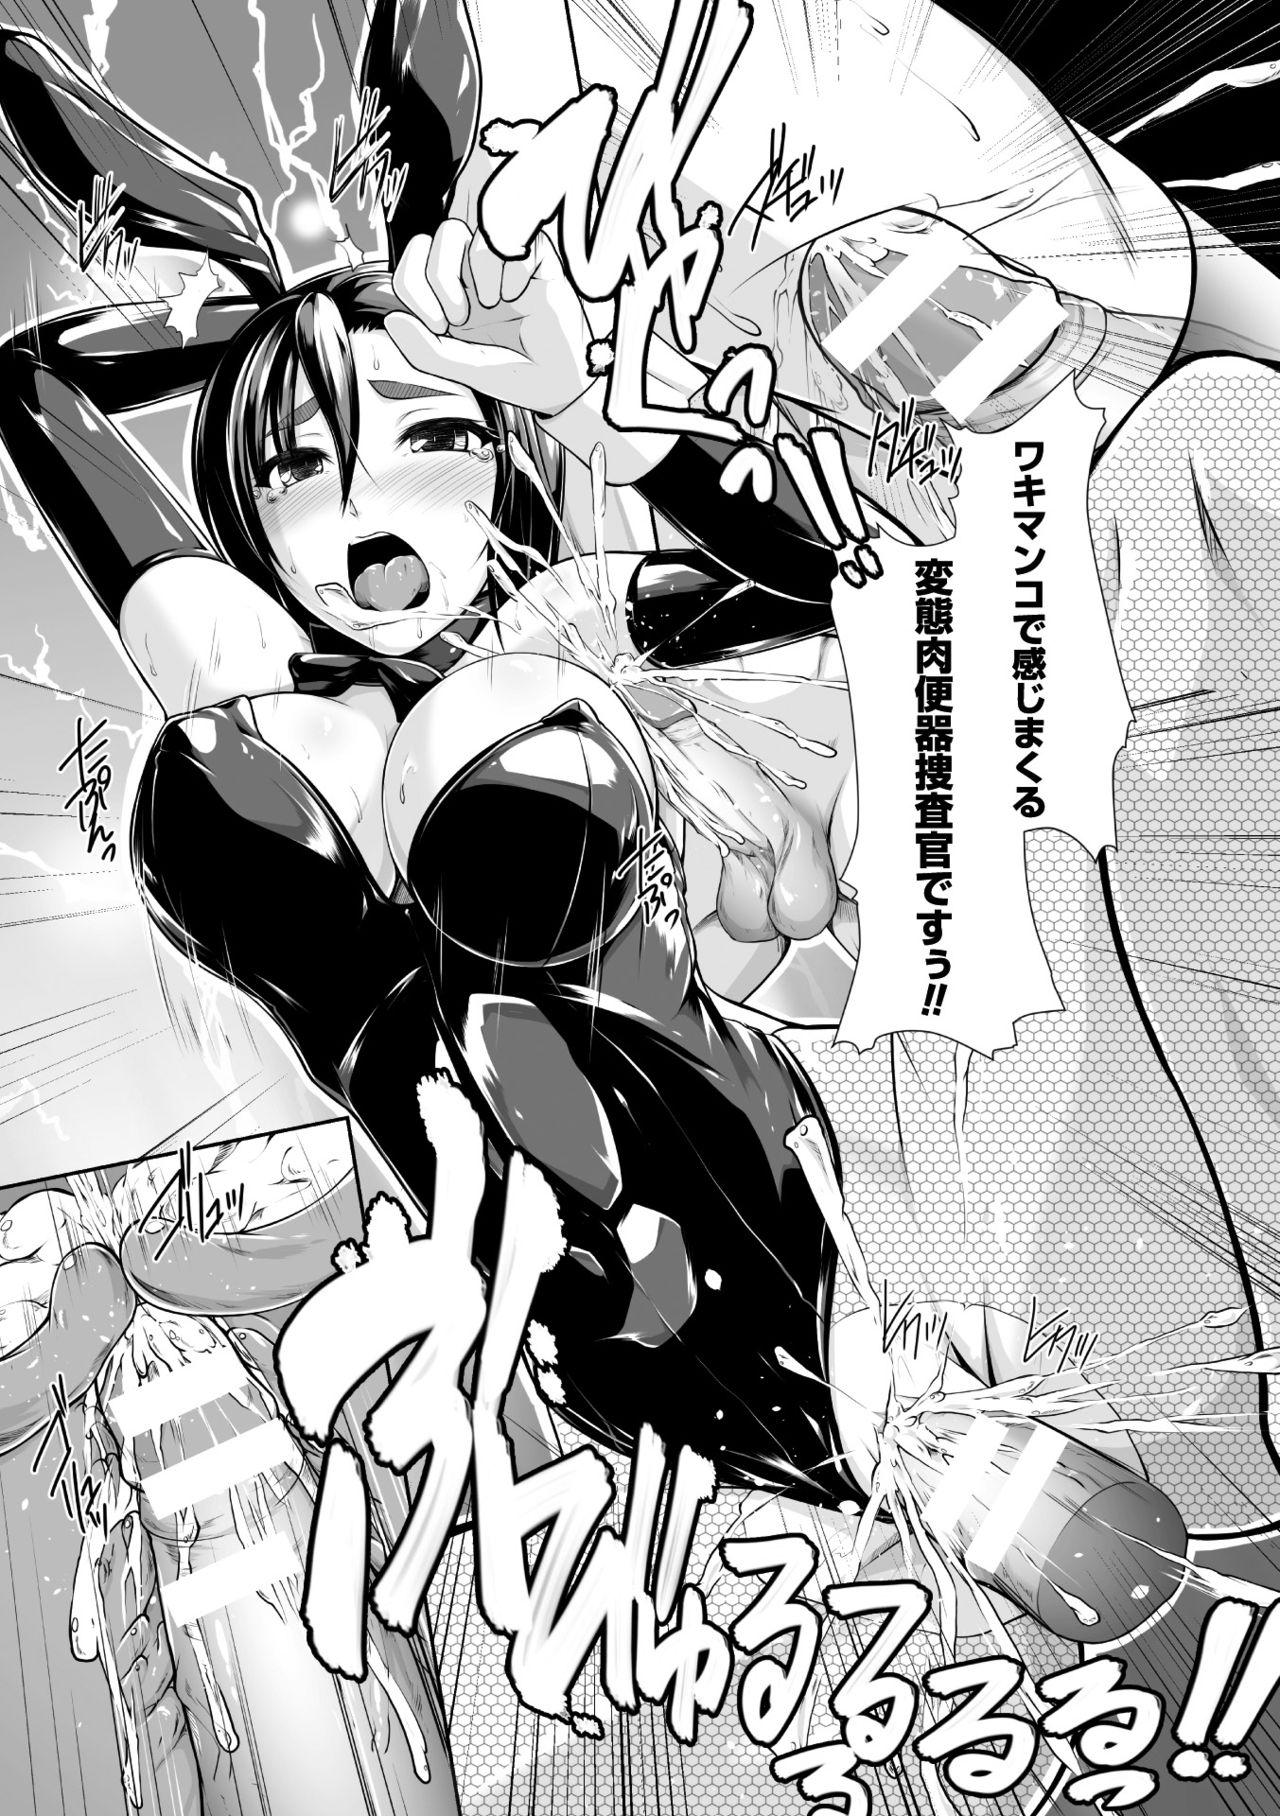 2D Comic Magazine Waki Feti Bunny Girl Vol. 1 22